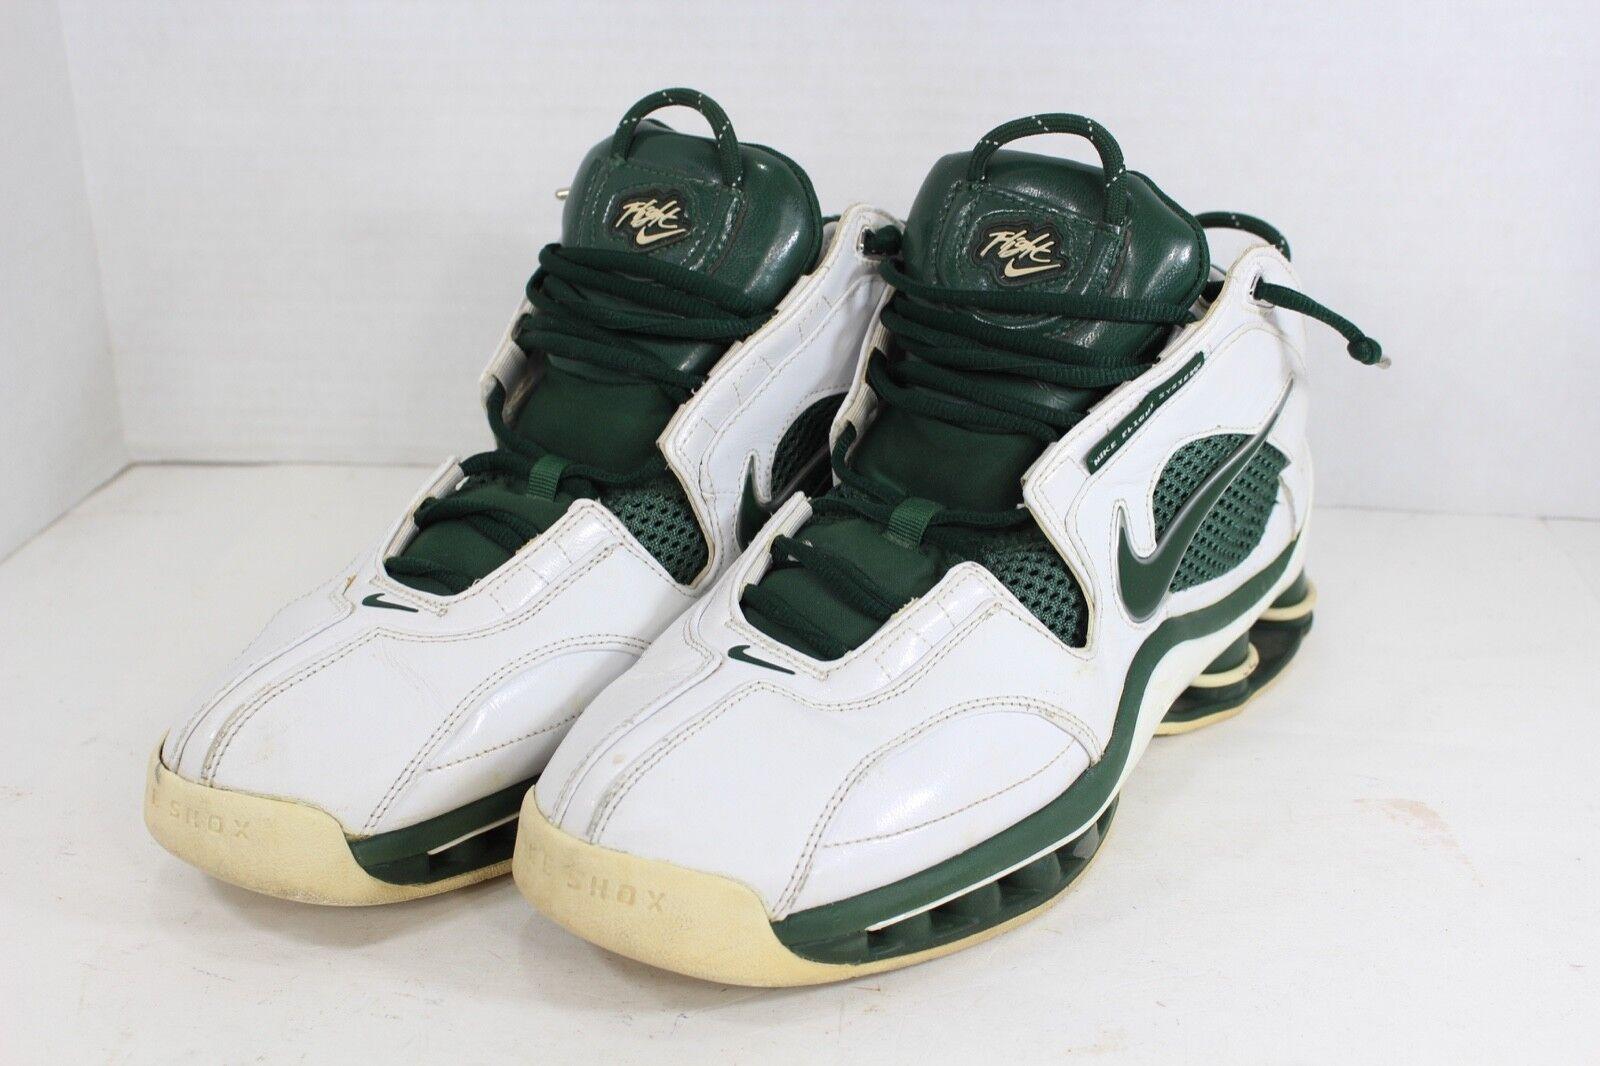 Vintage Nike Mens 11 Shox Flight Basketball Cross Training Running shoes Green